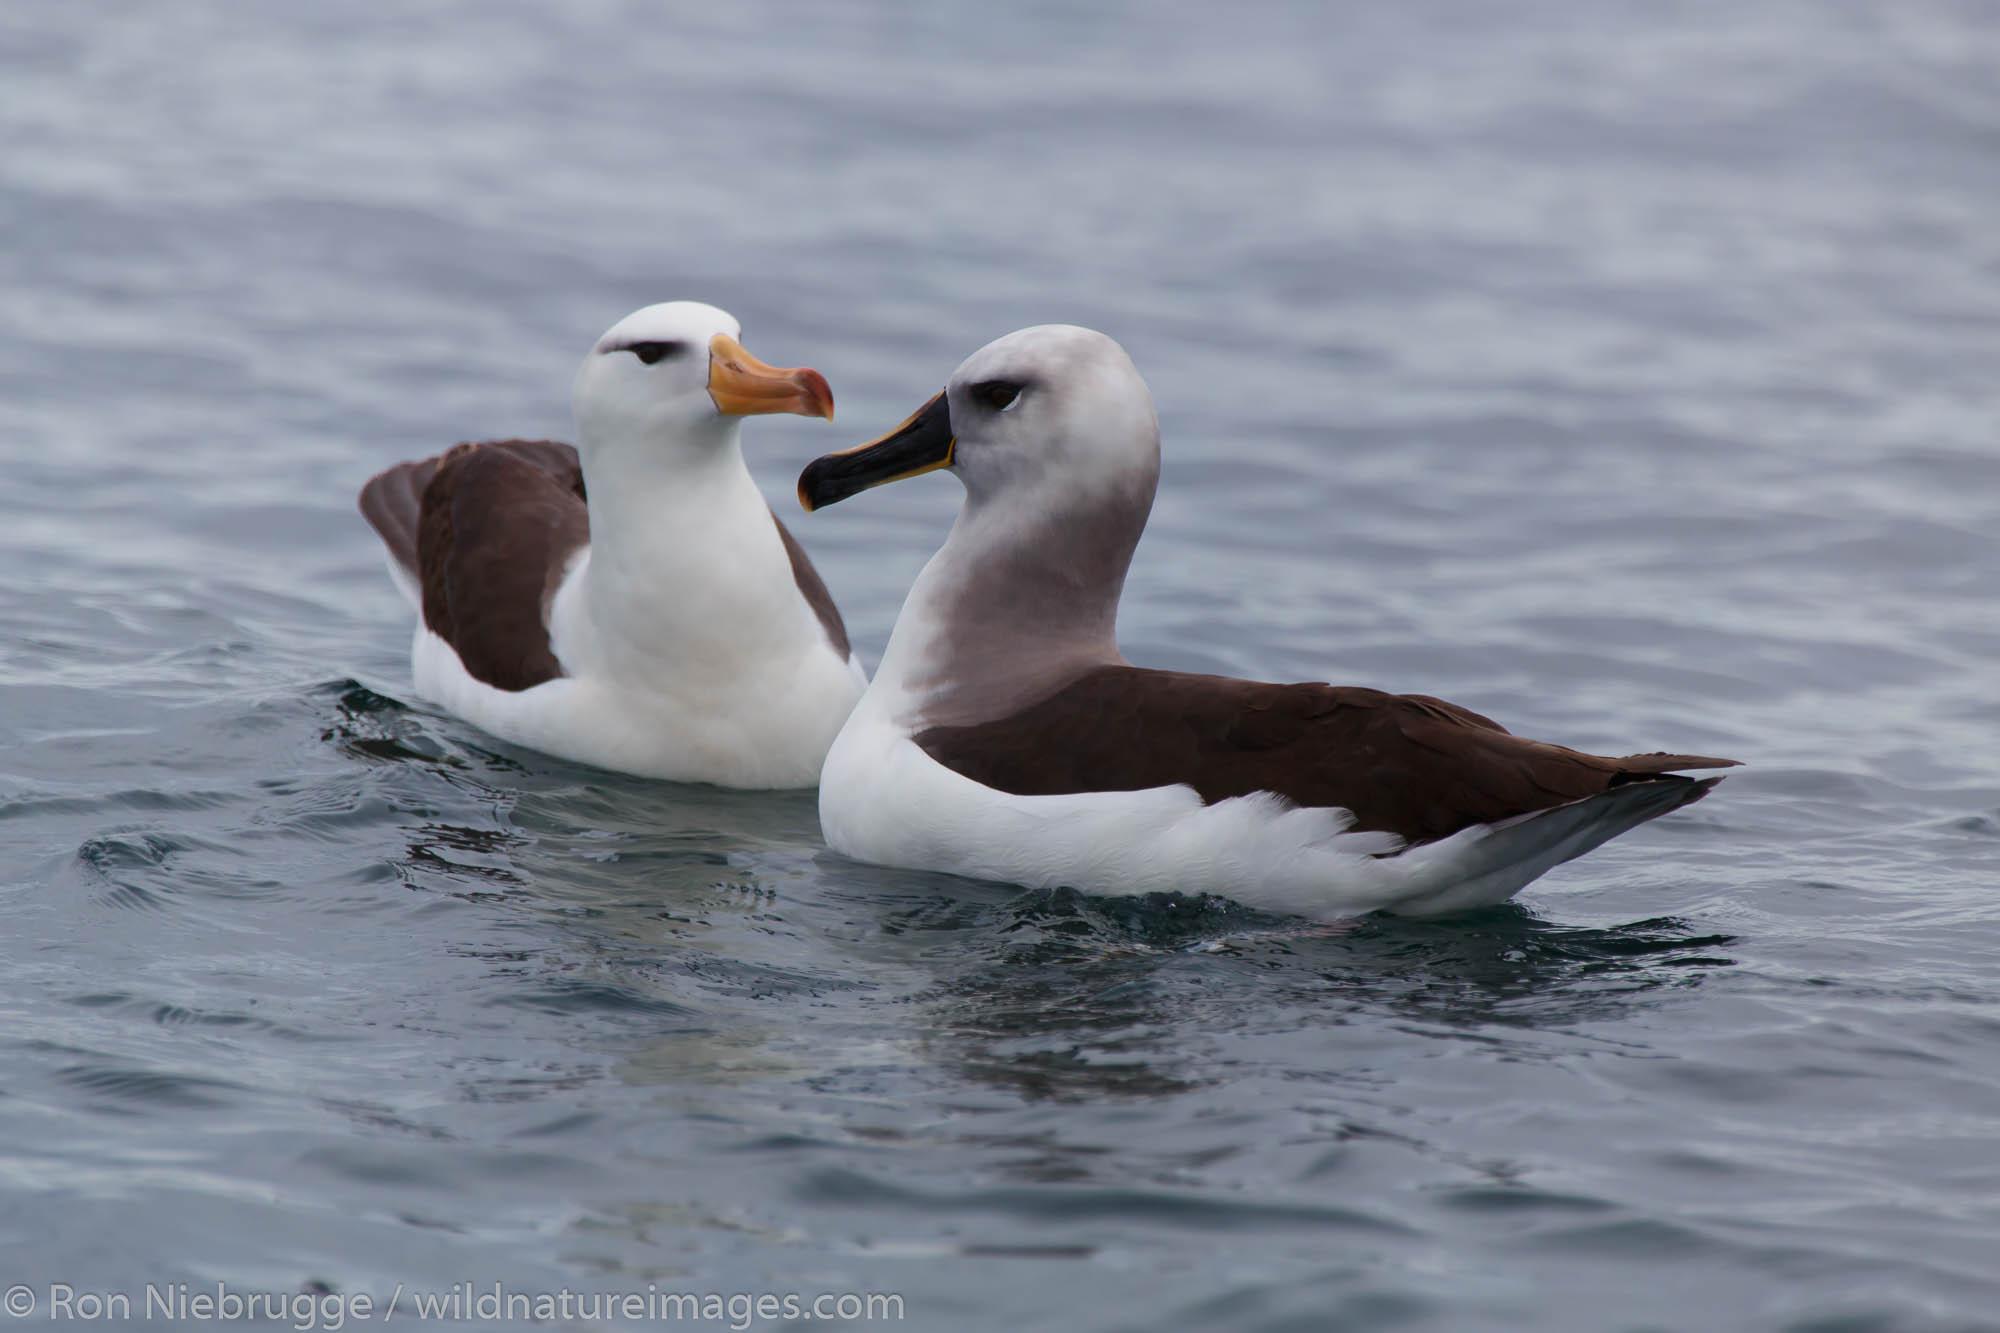 Black-browed albatross (Thalassarche melanophrys) and a grey-headed albatross (Thalassarche chrysostoma), Cooper Bay, South Georgia...